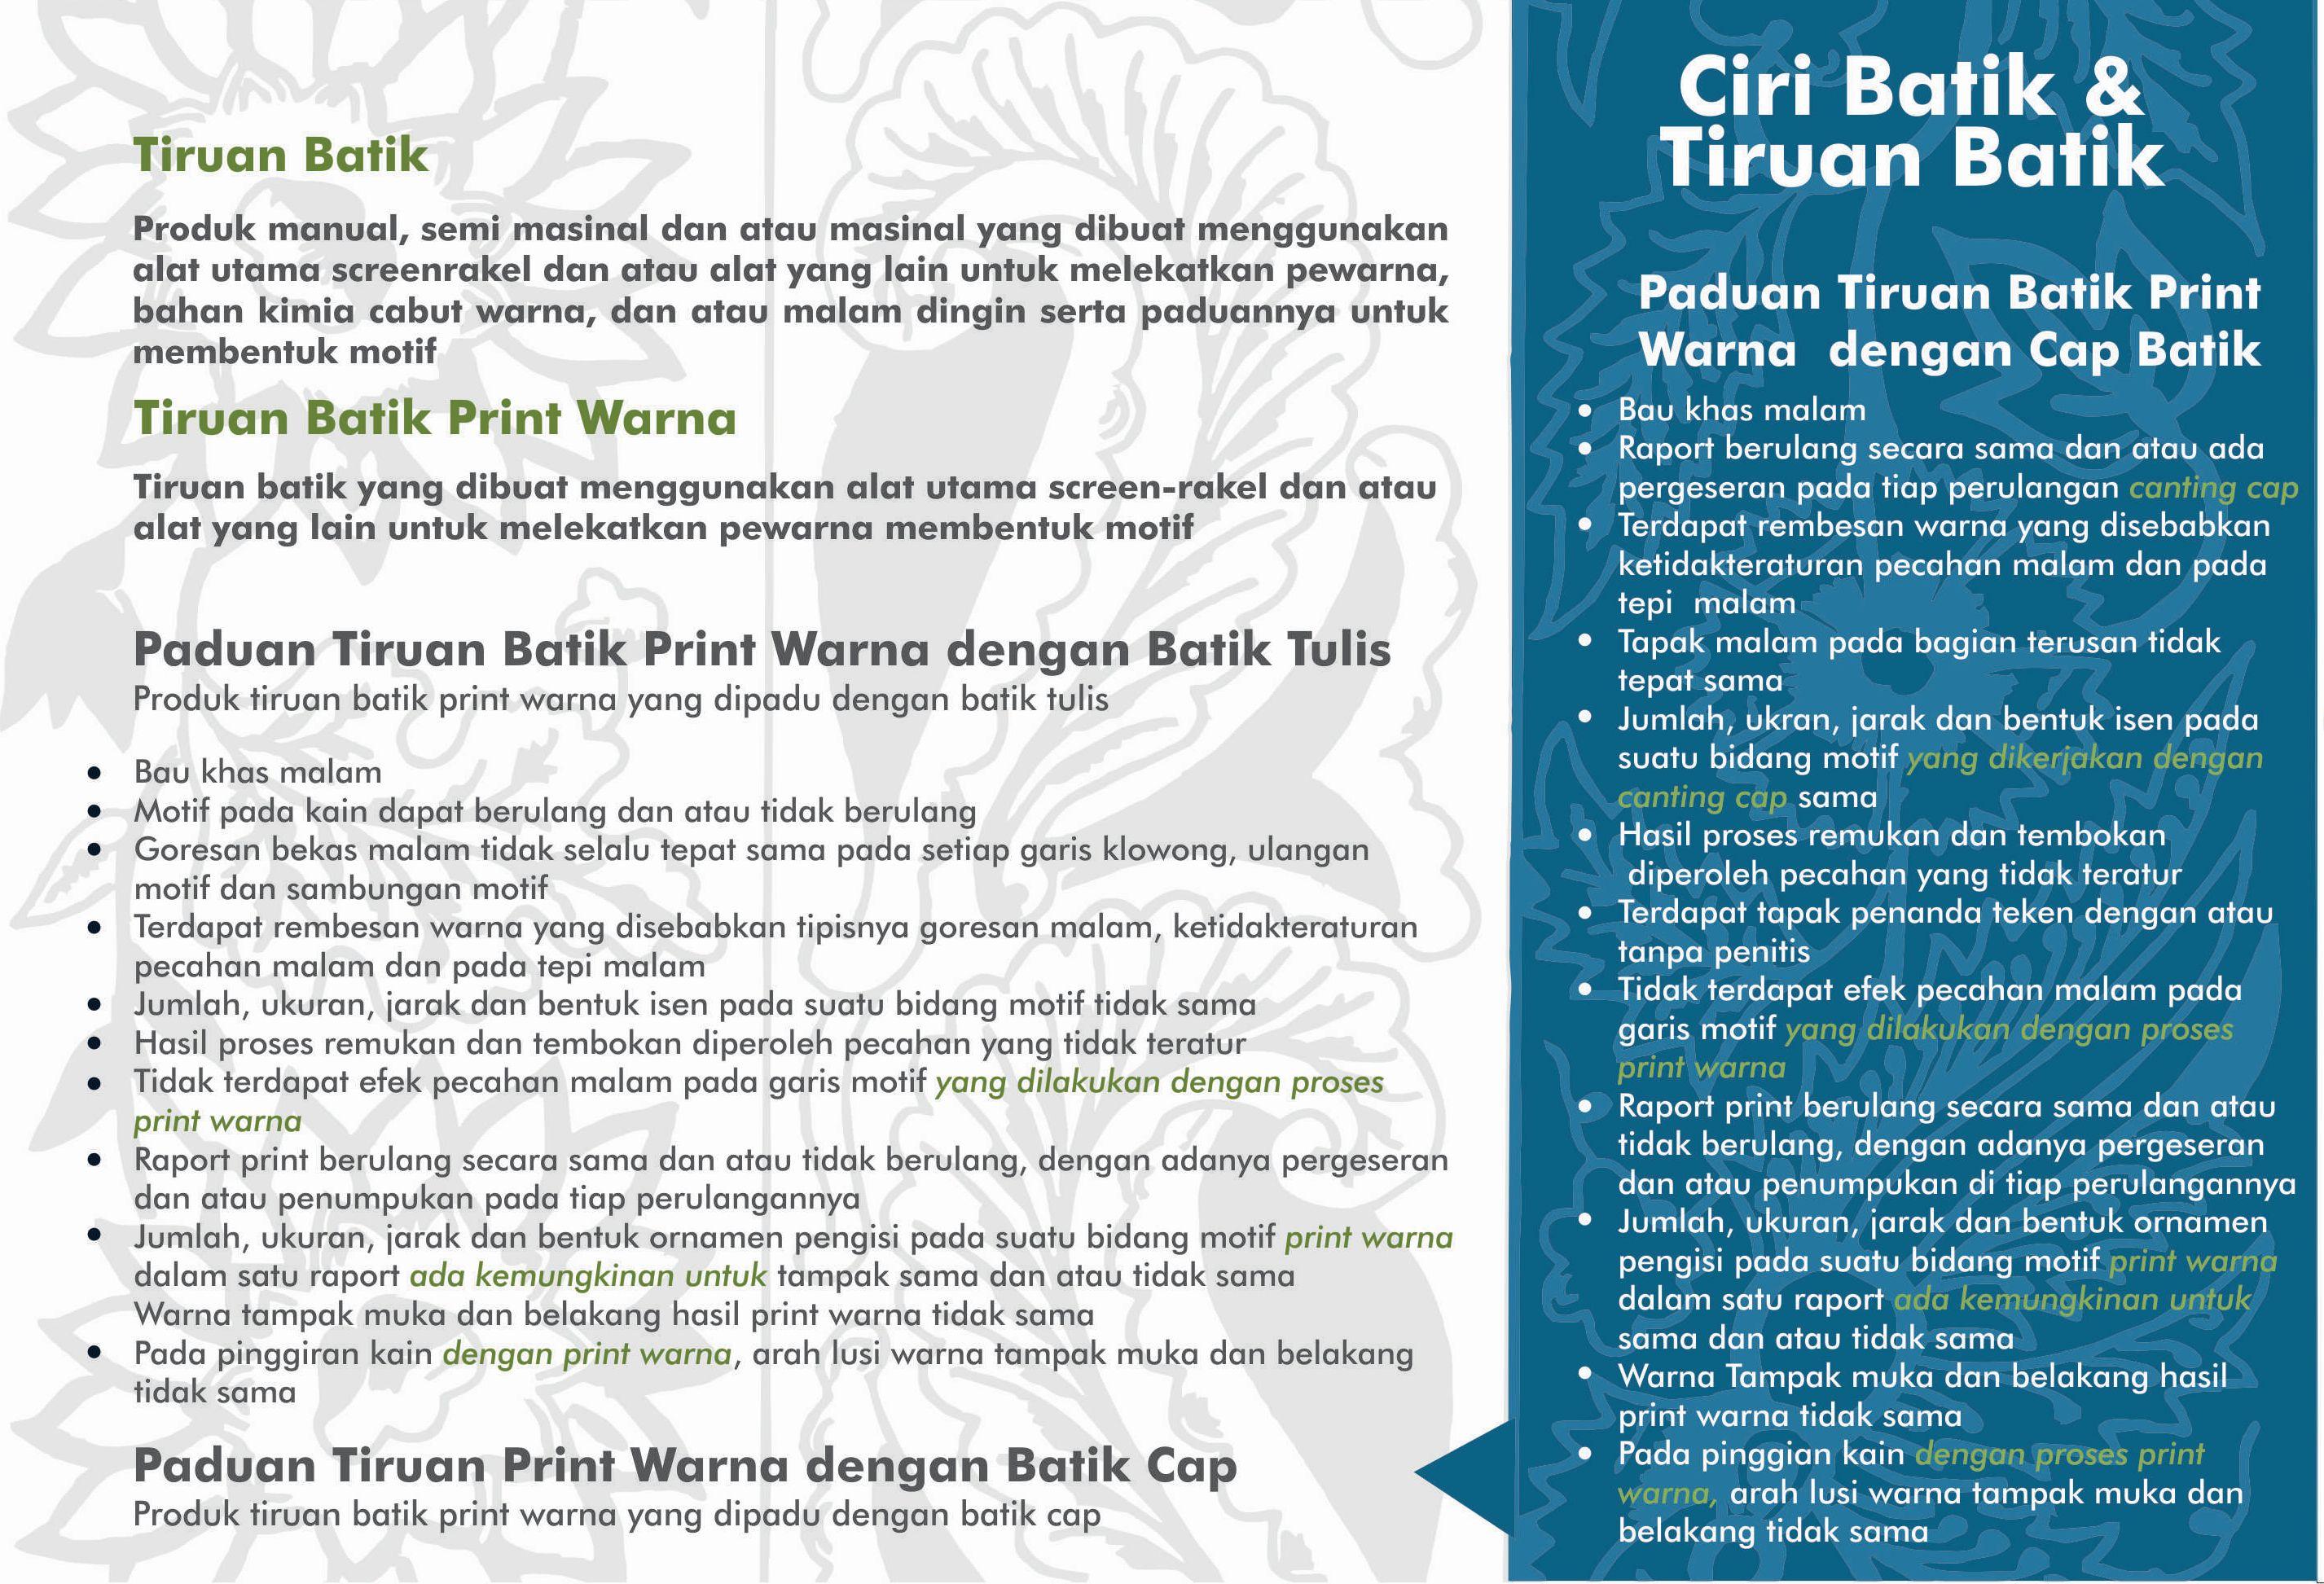 Ciri Batik II